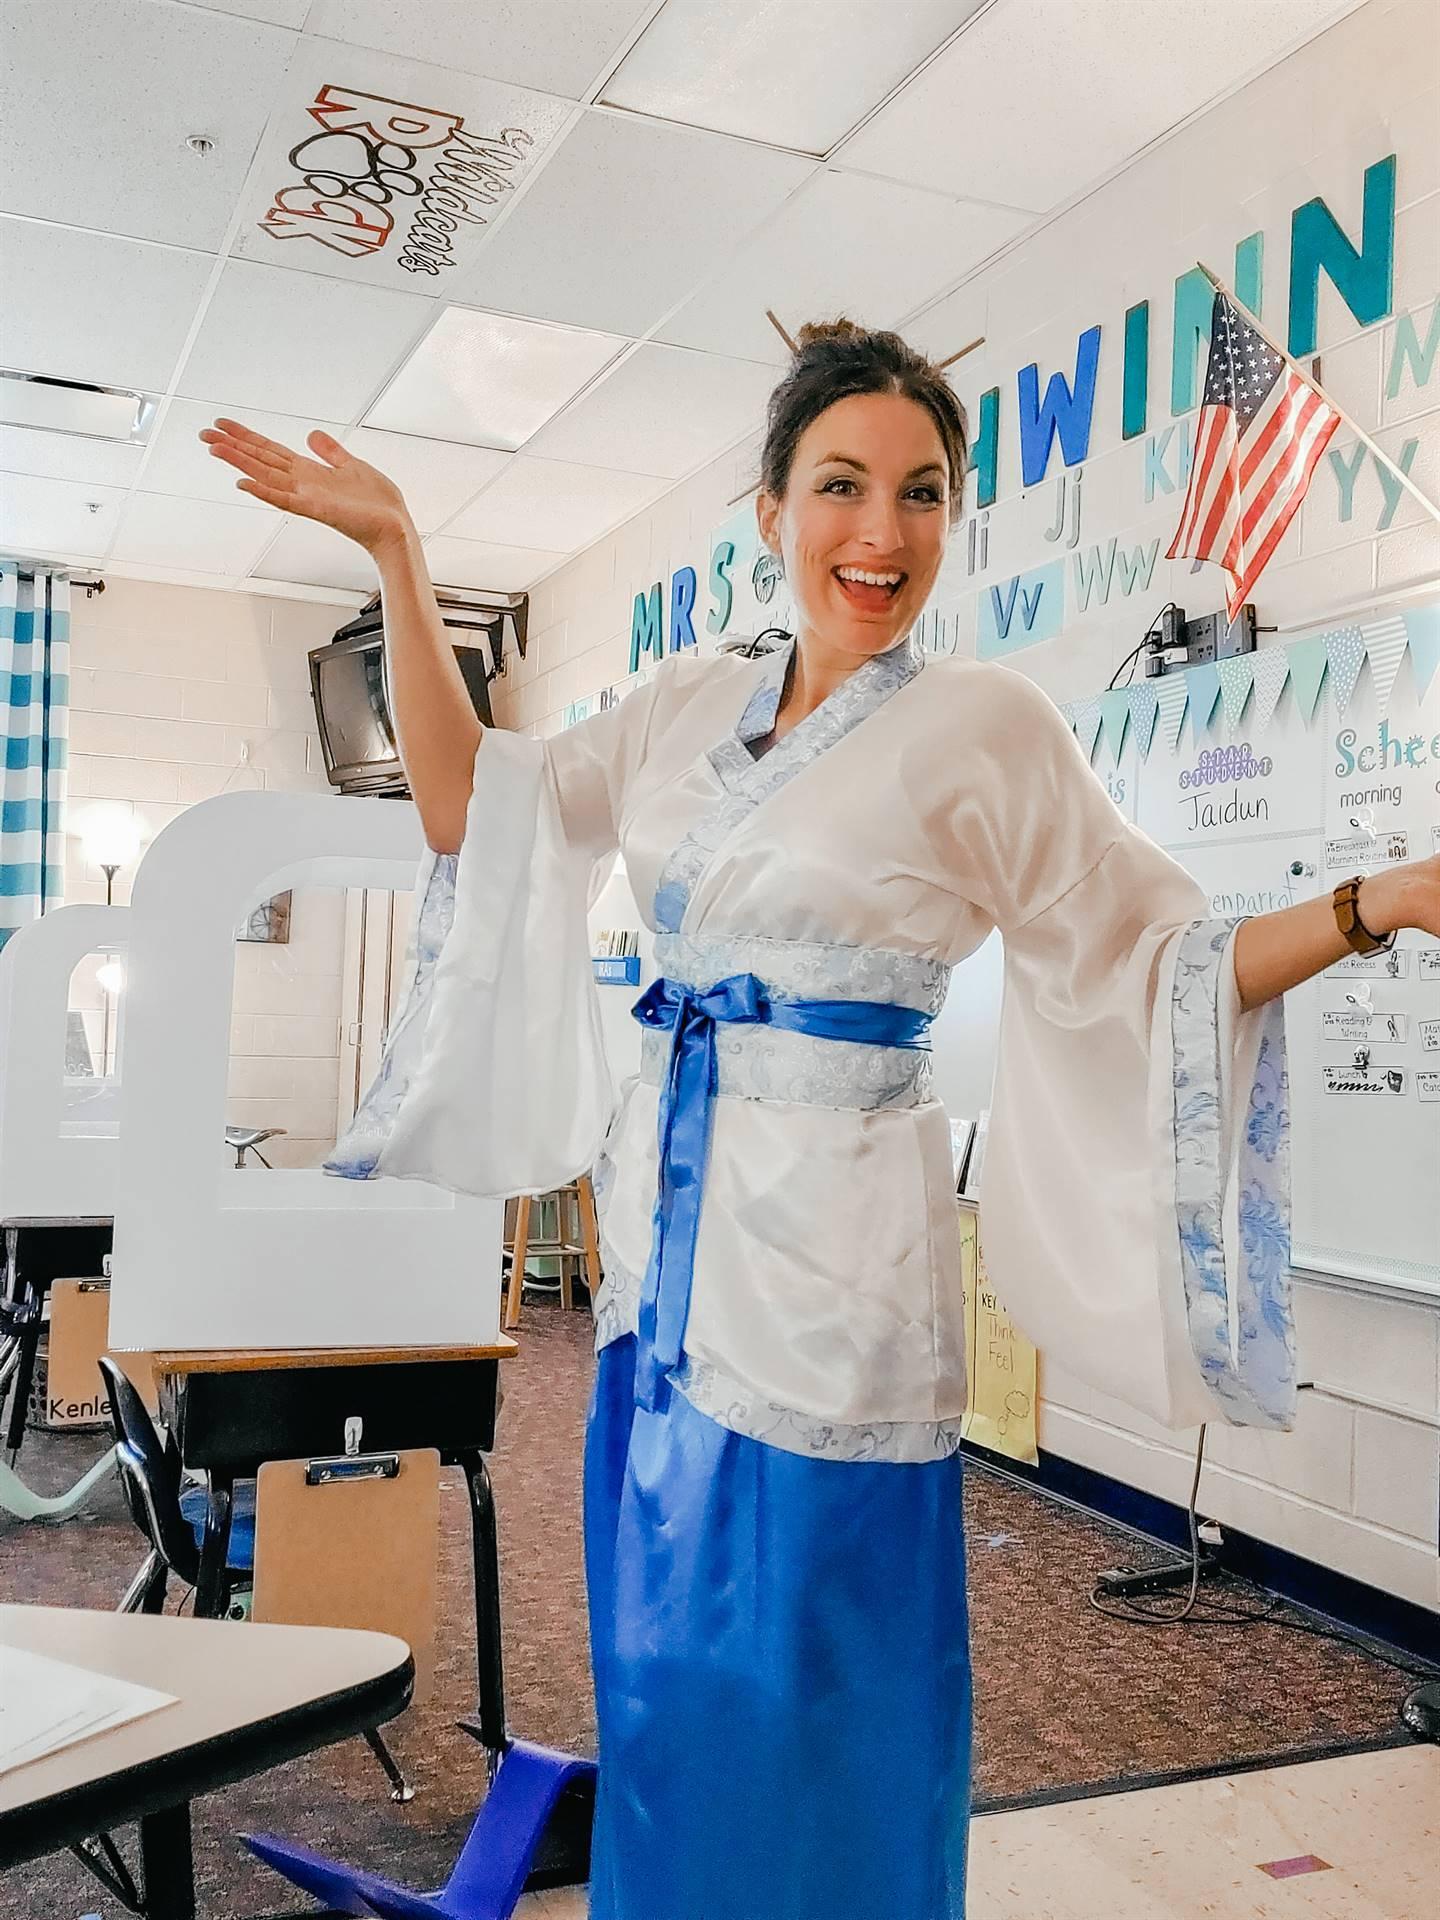 Mrs. Schwinn dressed for the activity